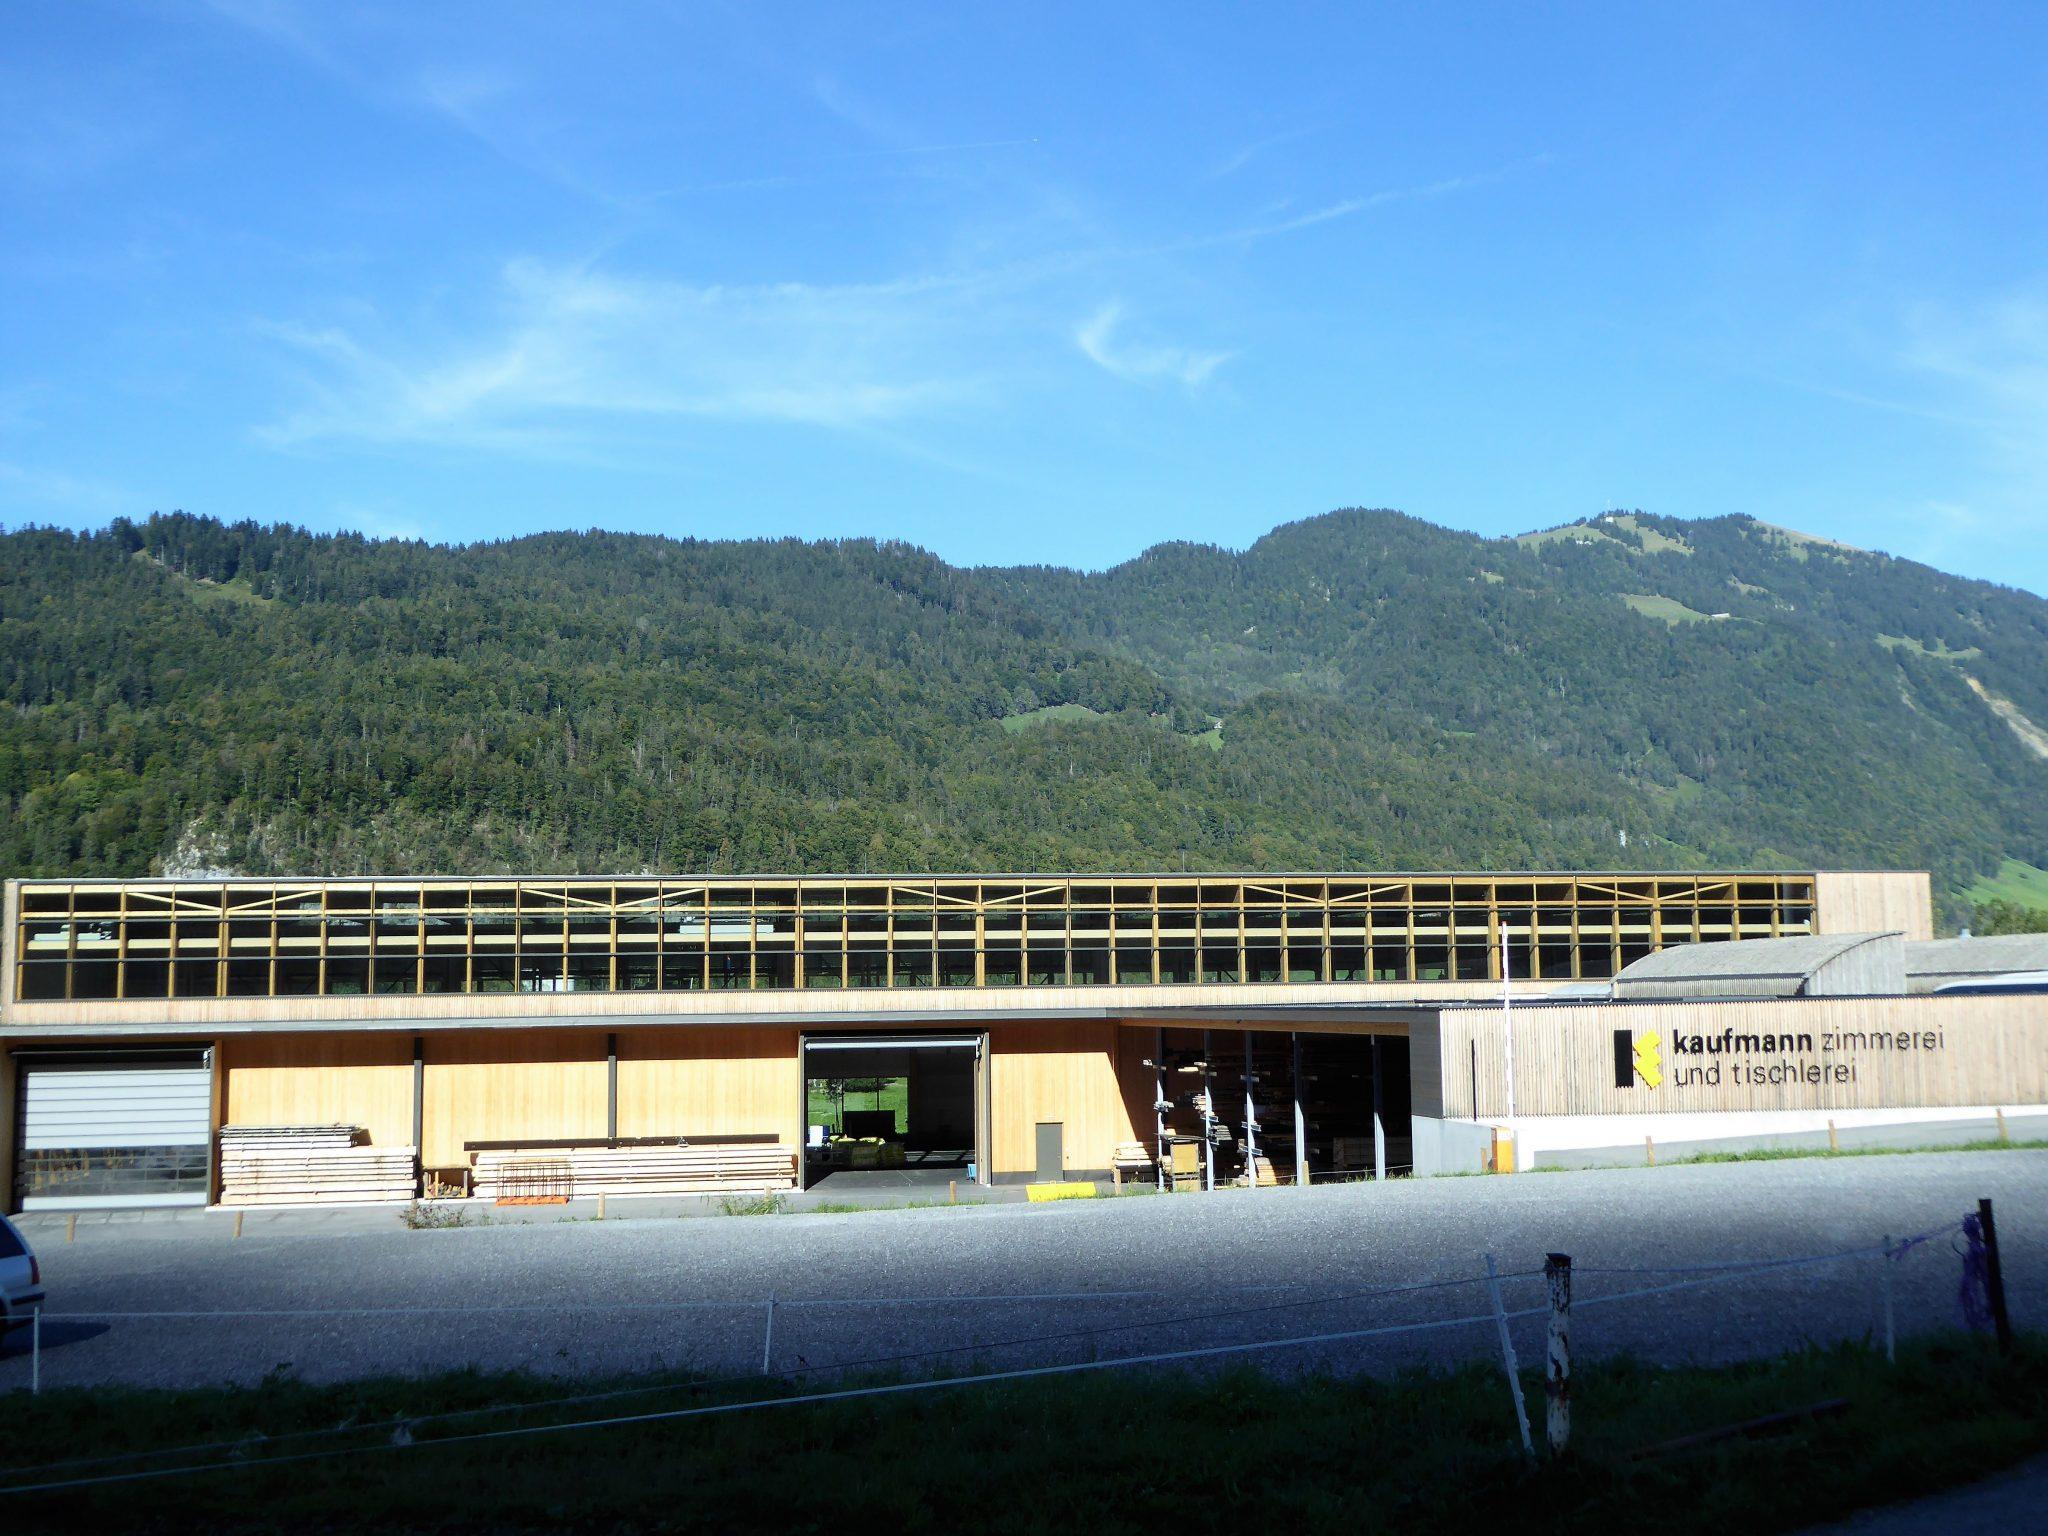 Montagehalle Kaufmann, Reuthe